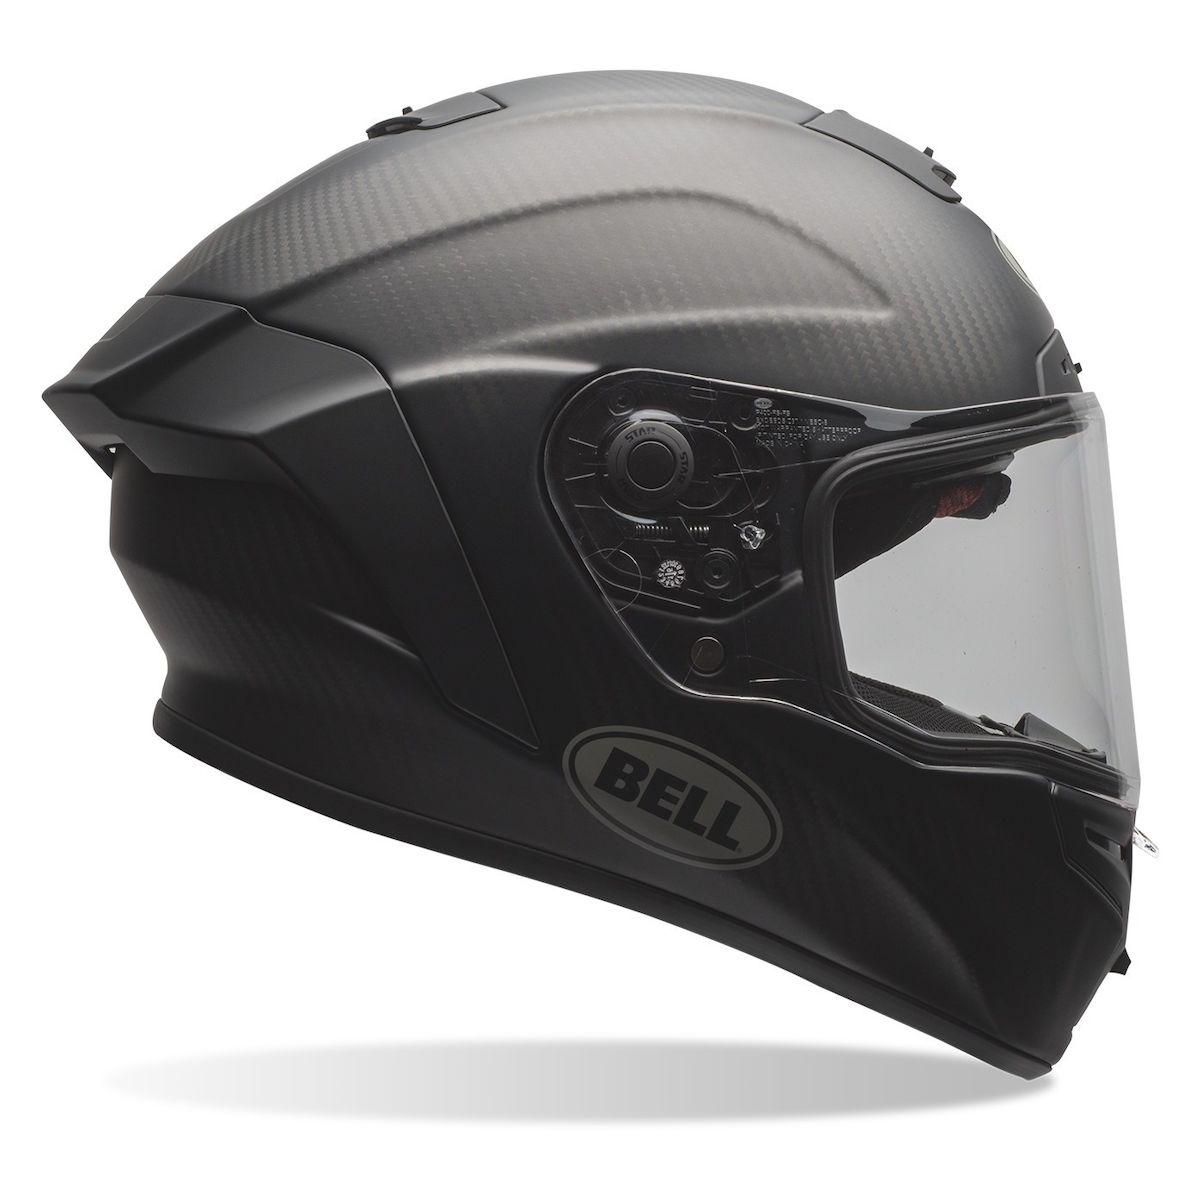 Bell Motorcycle Helmet >> Bell Race Star Motorcycle Helmet Revzilla